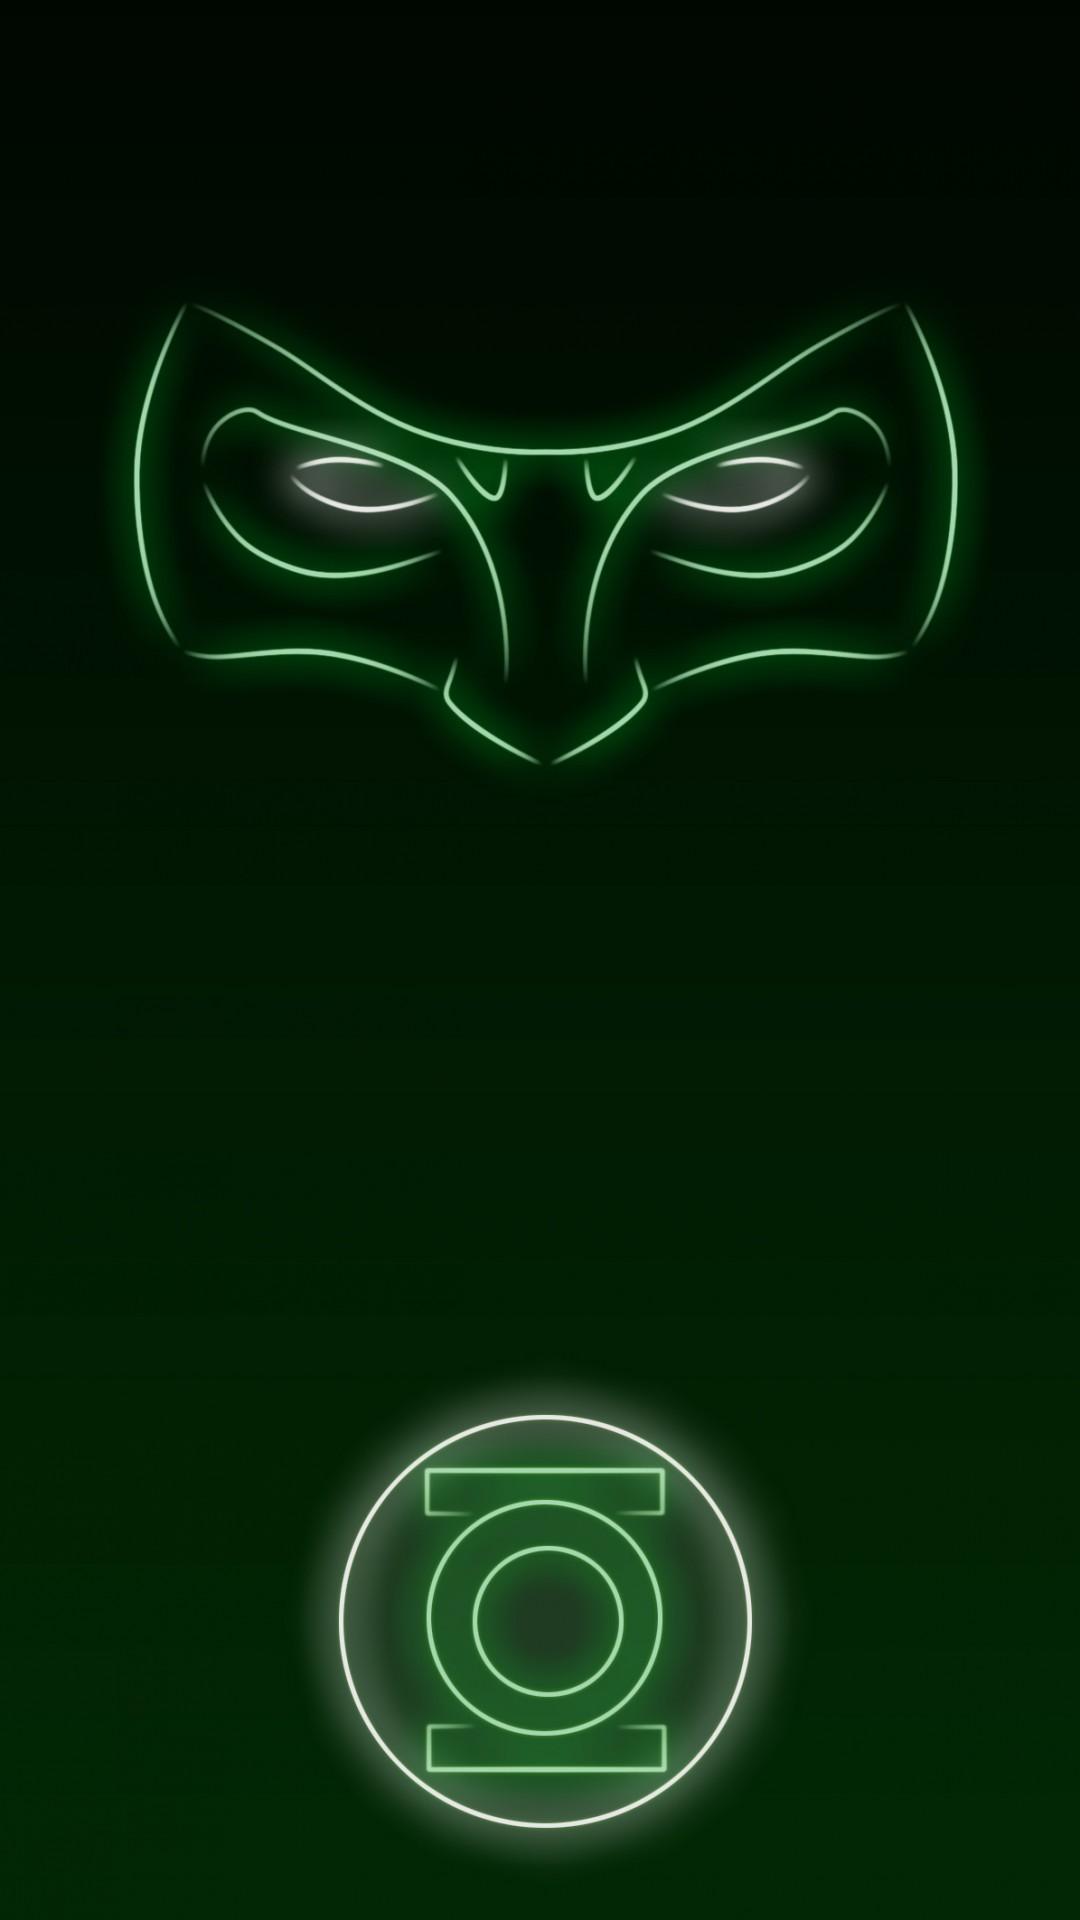 Download Neon Light Hero Green Lantern 1080 x 1920 Wallpapers – 4644331 –  neon light superhero